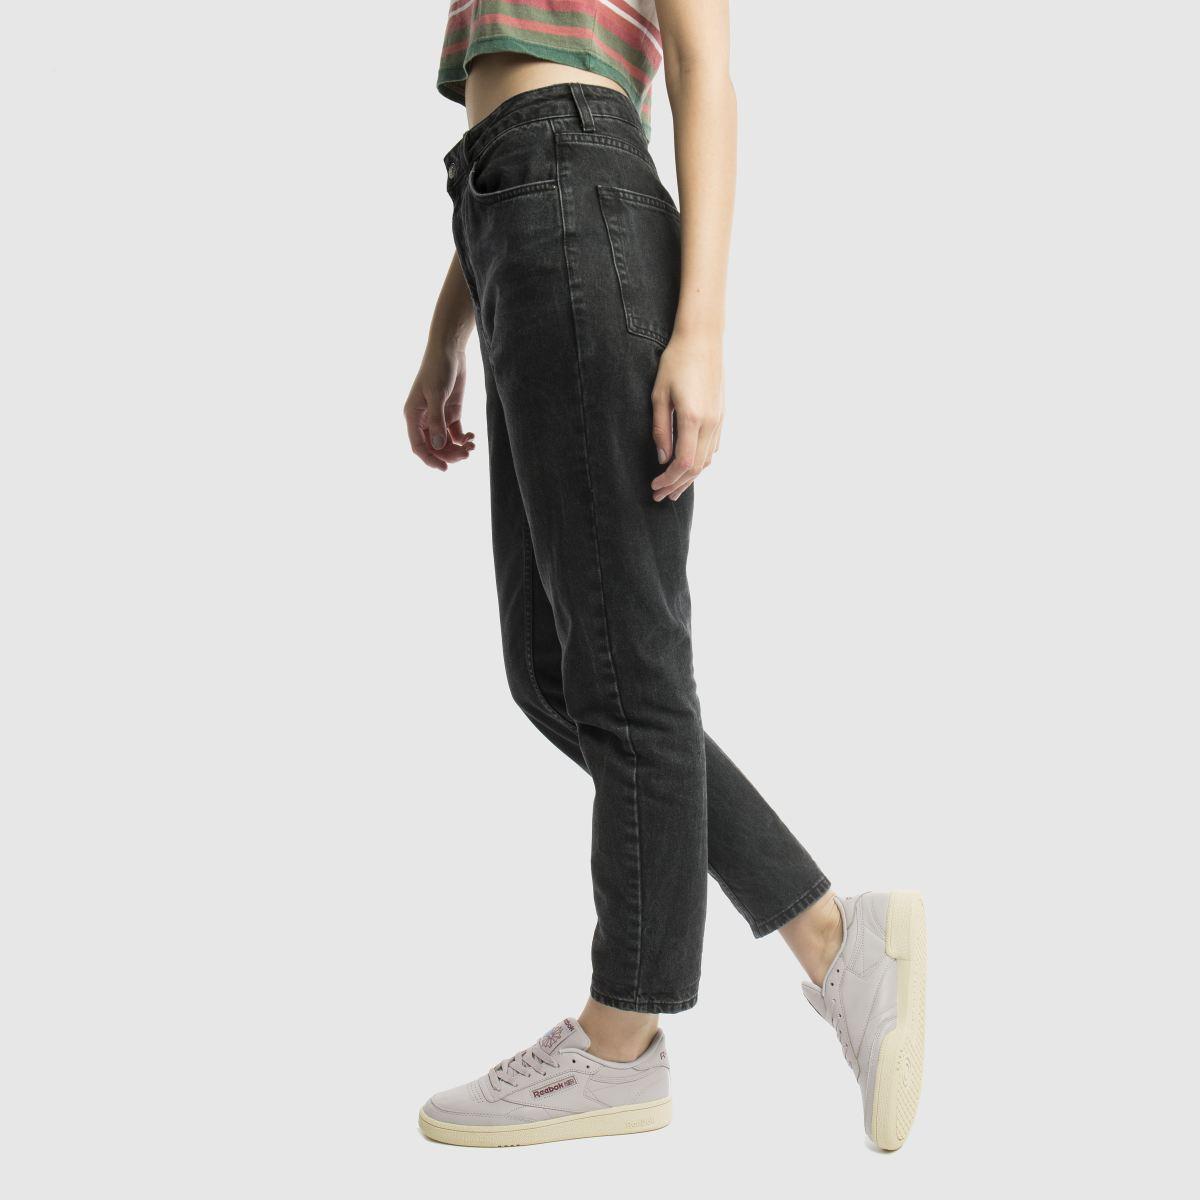 Damen Blaulila reebok Club C Vintage Sneaker | schuh Gute Qualität beliebte Schuhe